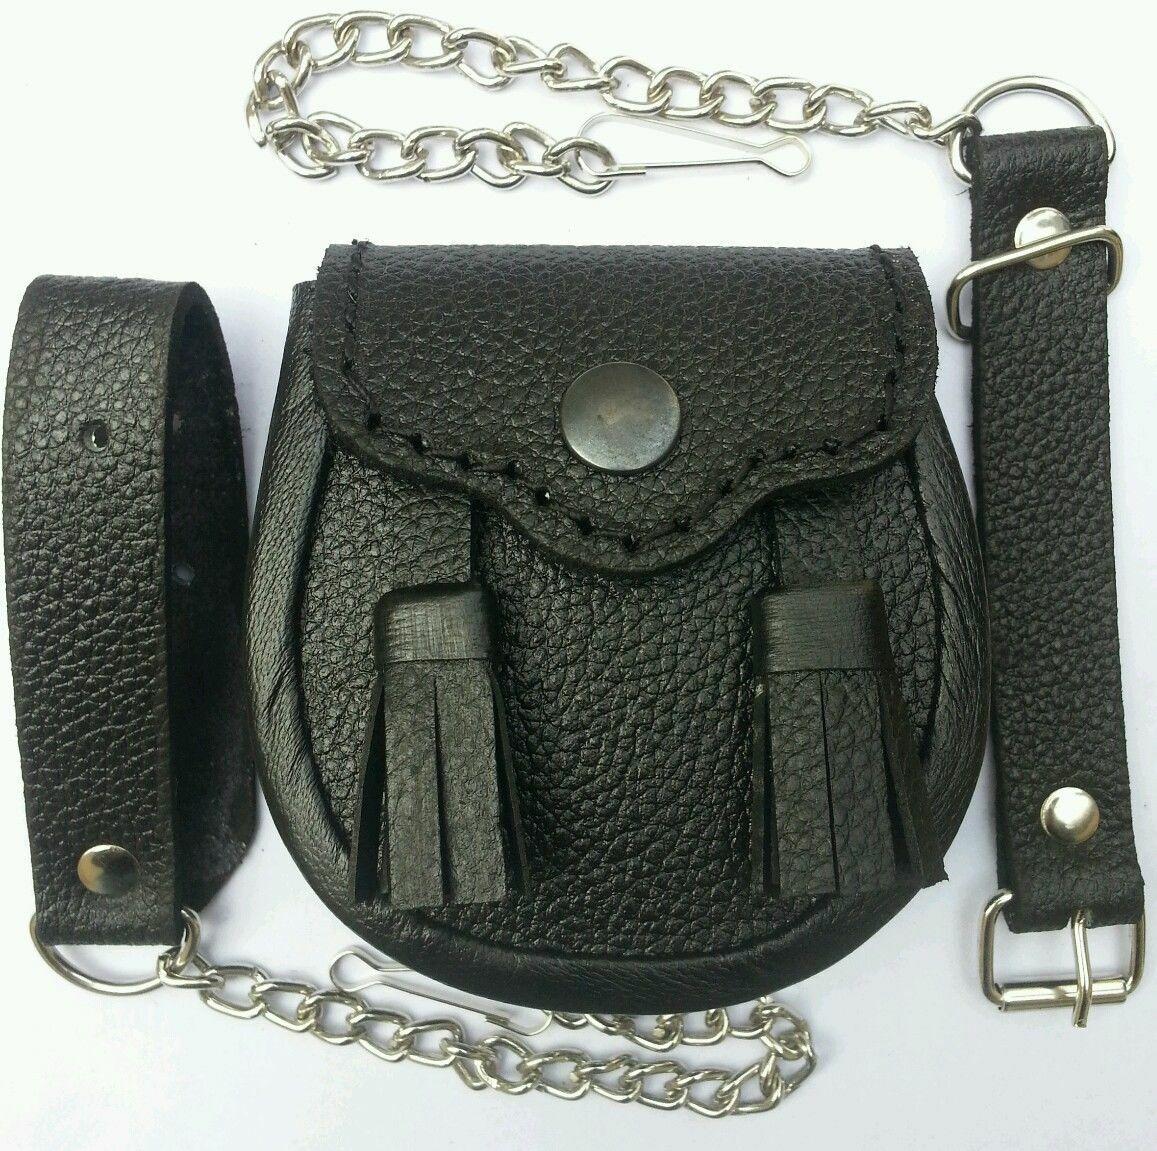 Baby Size 2 Tassels Quality Black Cowhide Leather, Scottish Kilt Sporran no Belt